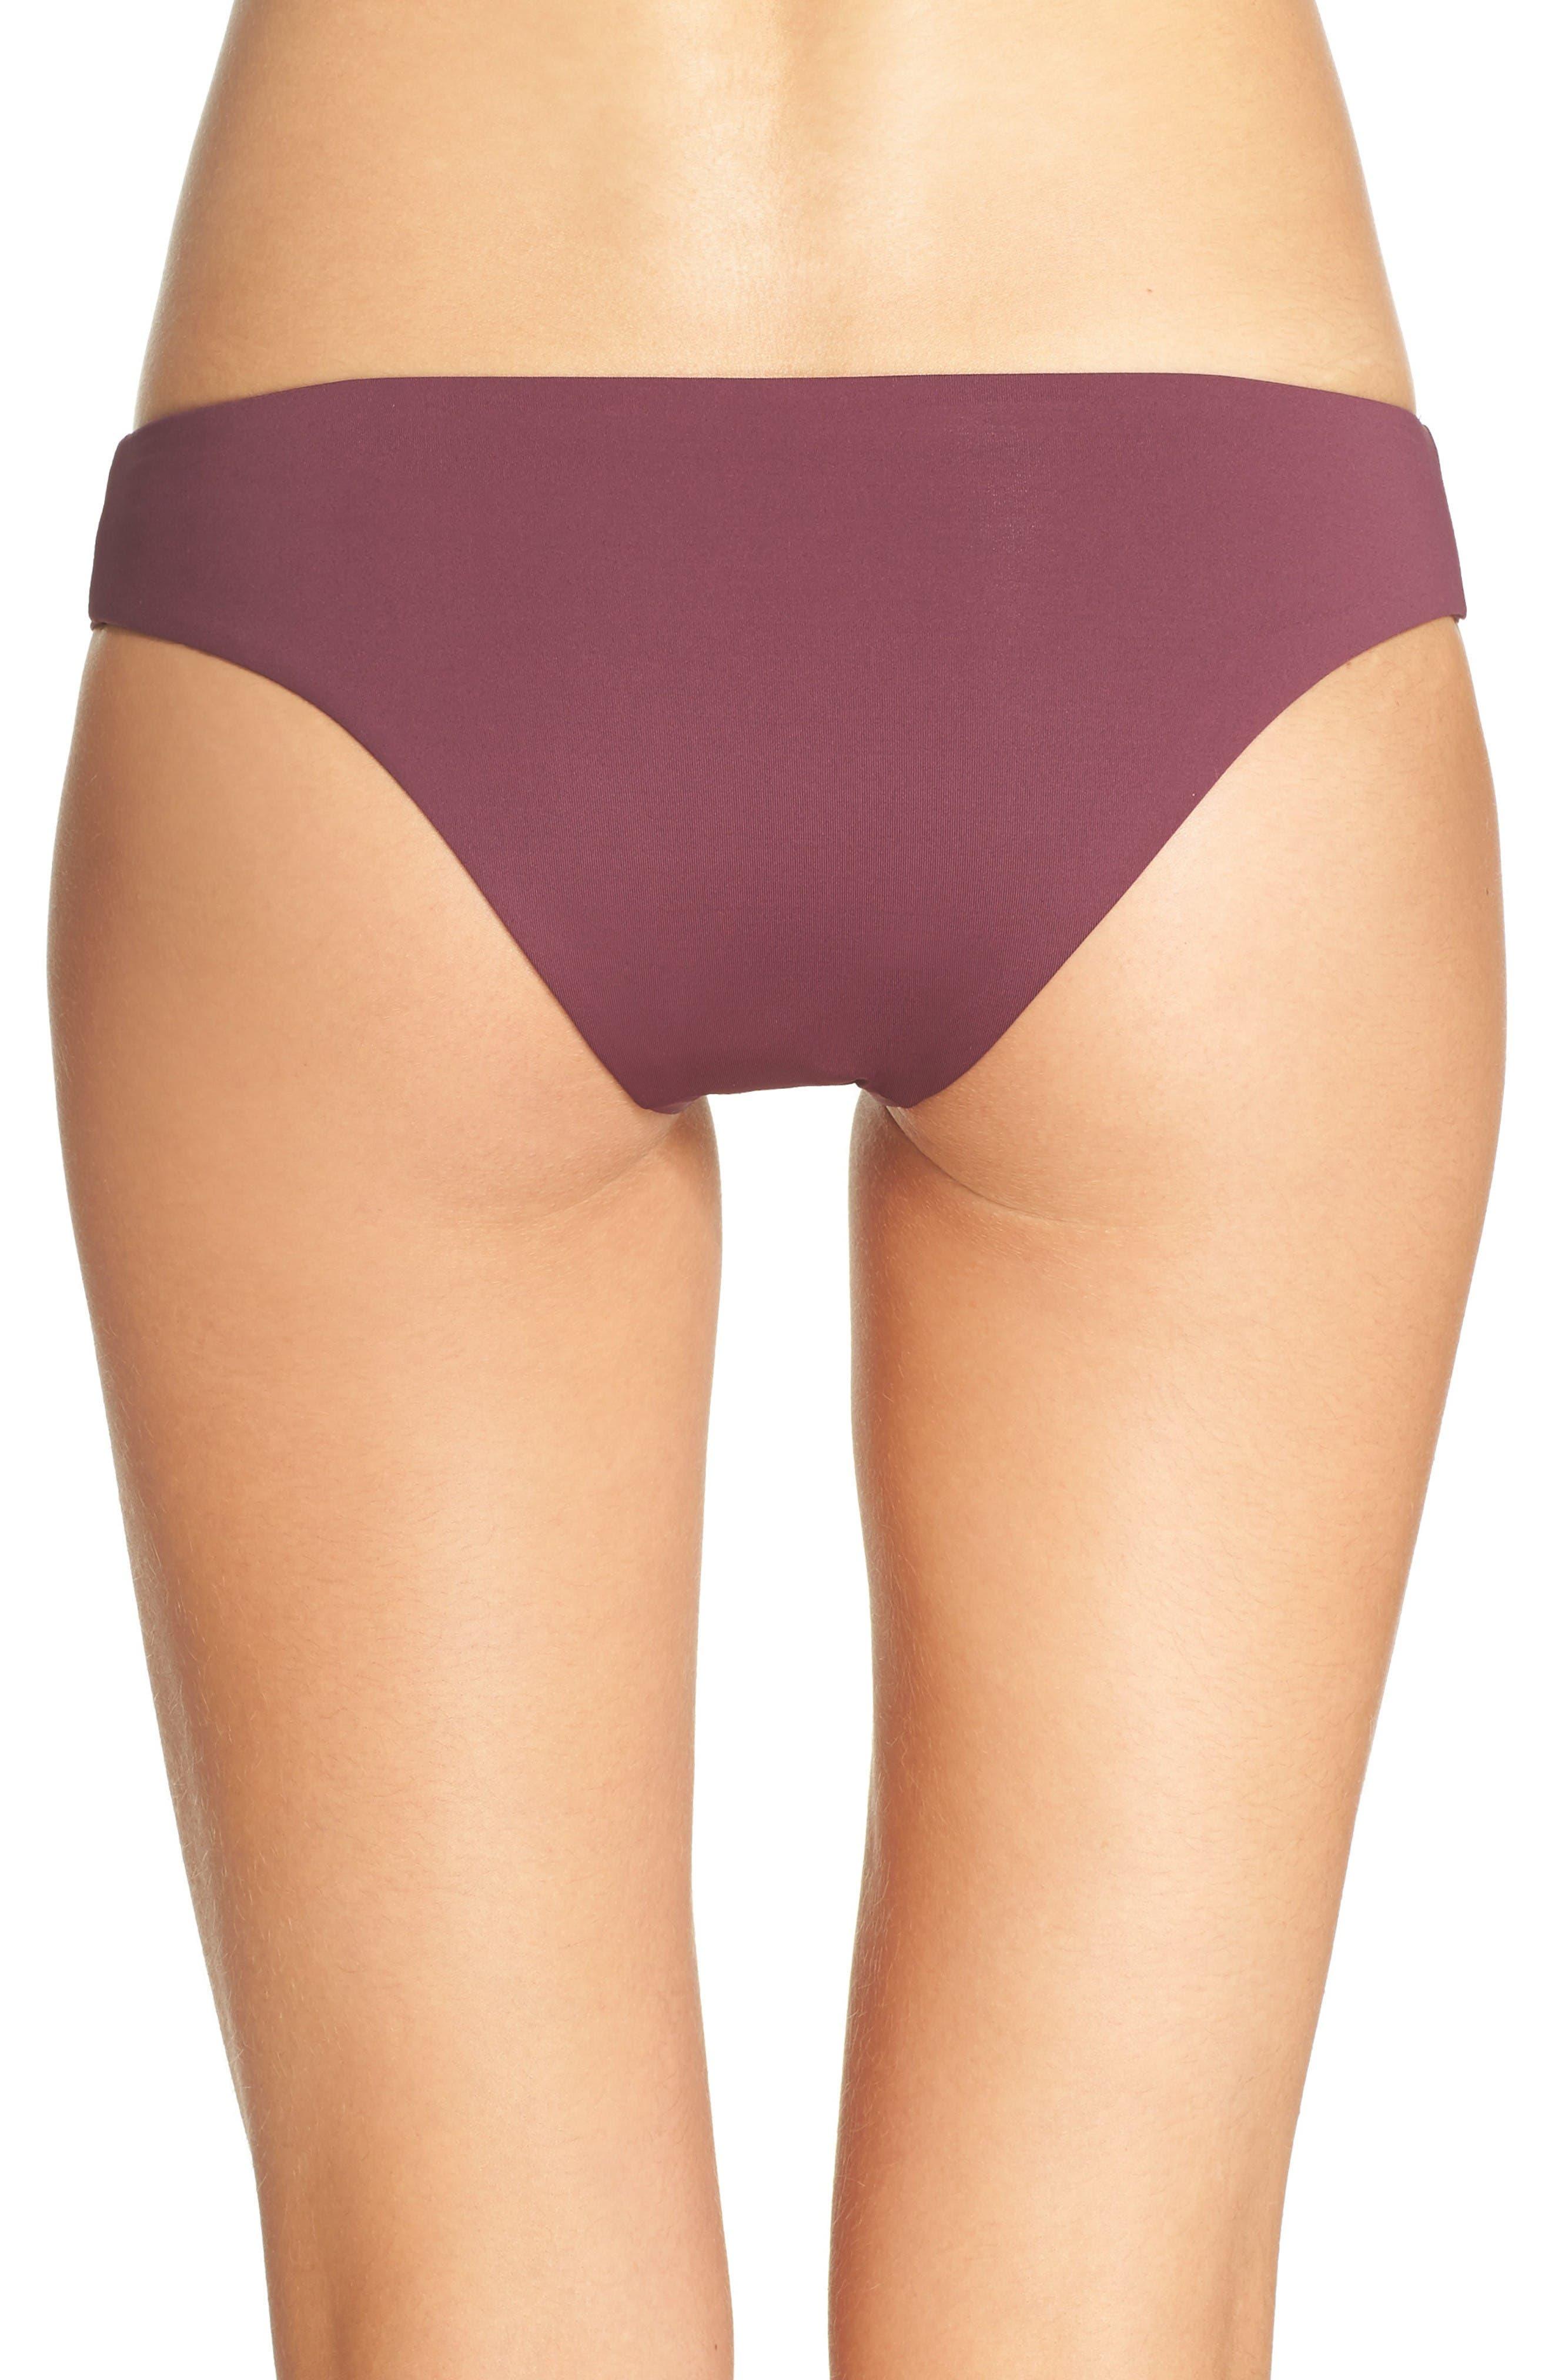 'Ali' Moderate Coverage Bikini Bottoms,                             Alternate thumbnail 2, color,                             Merlot